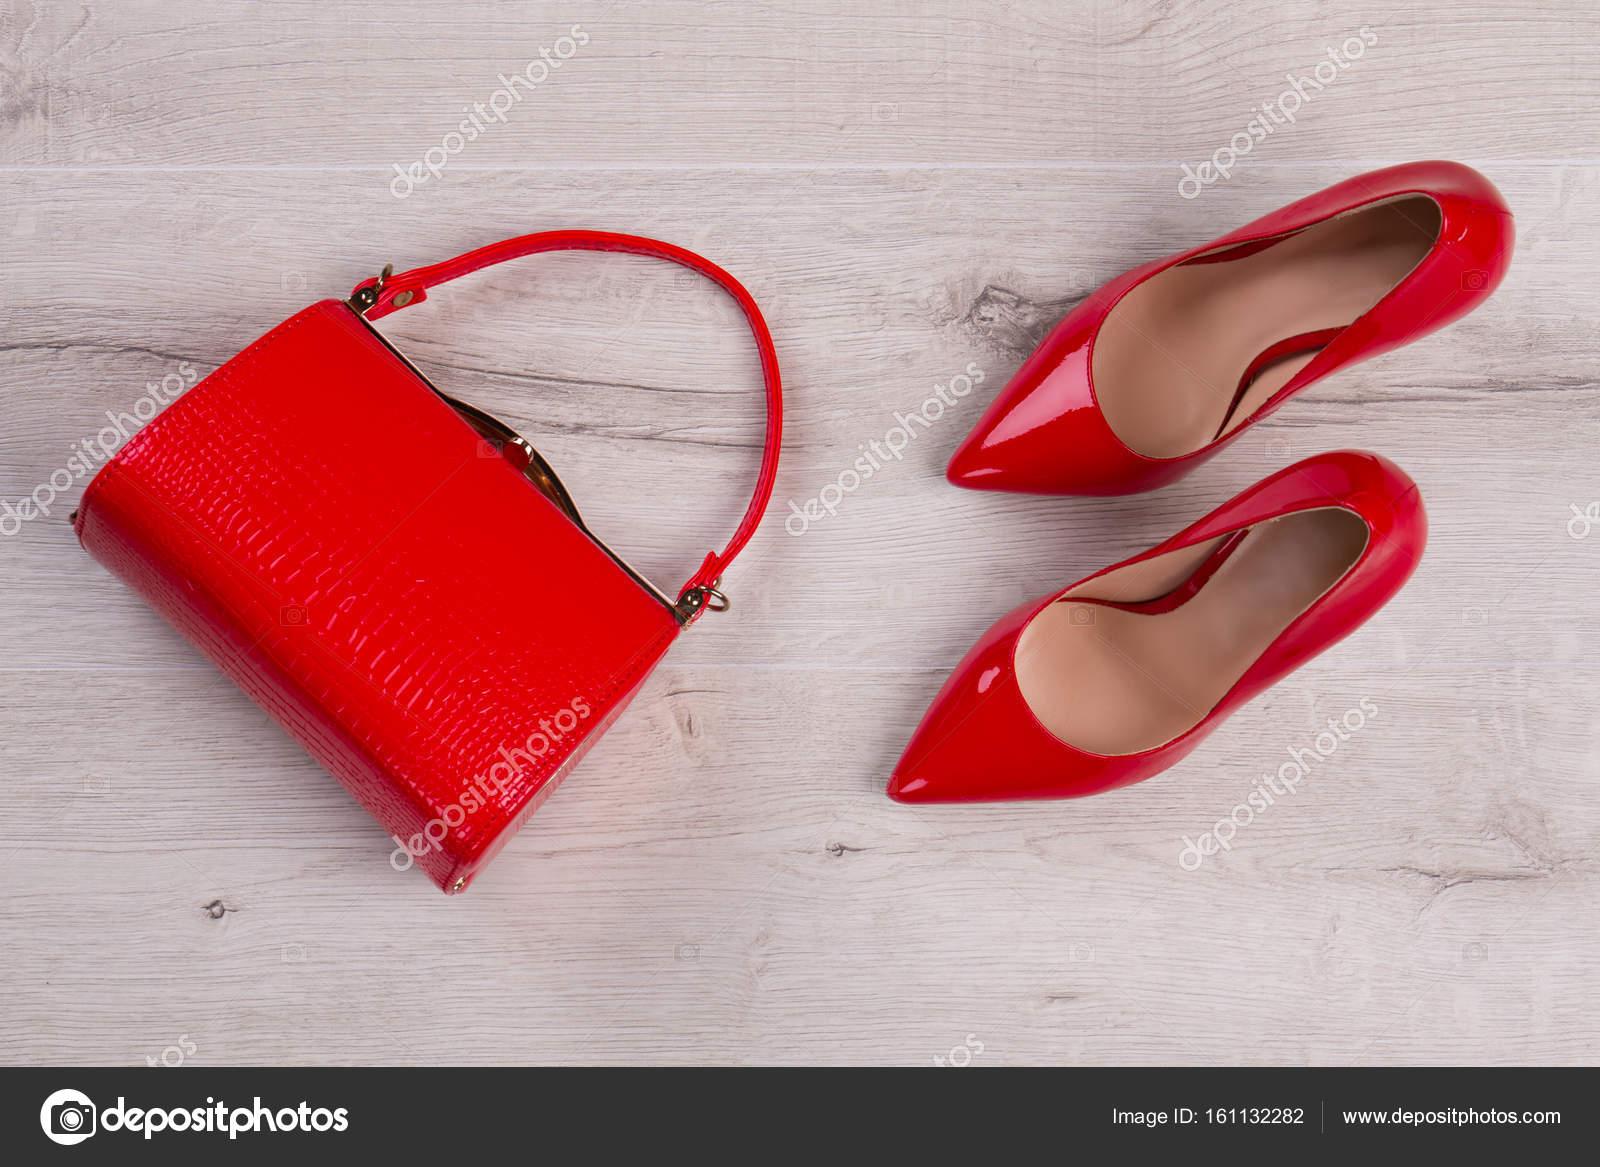 3001f9b27d Γυναικών κόκκινο σετ — Φωτογραφία Αρχείου © margostock  161132282